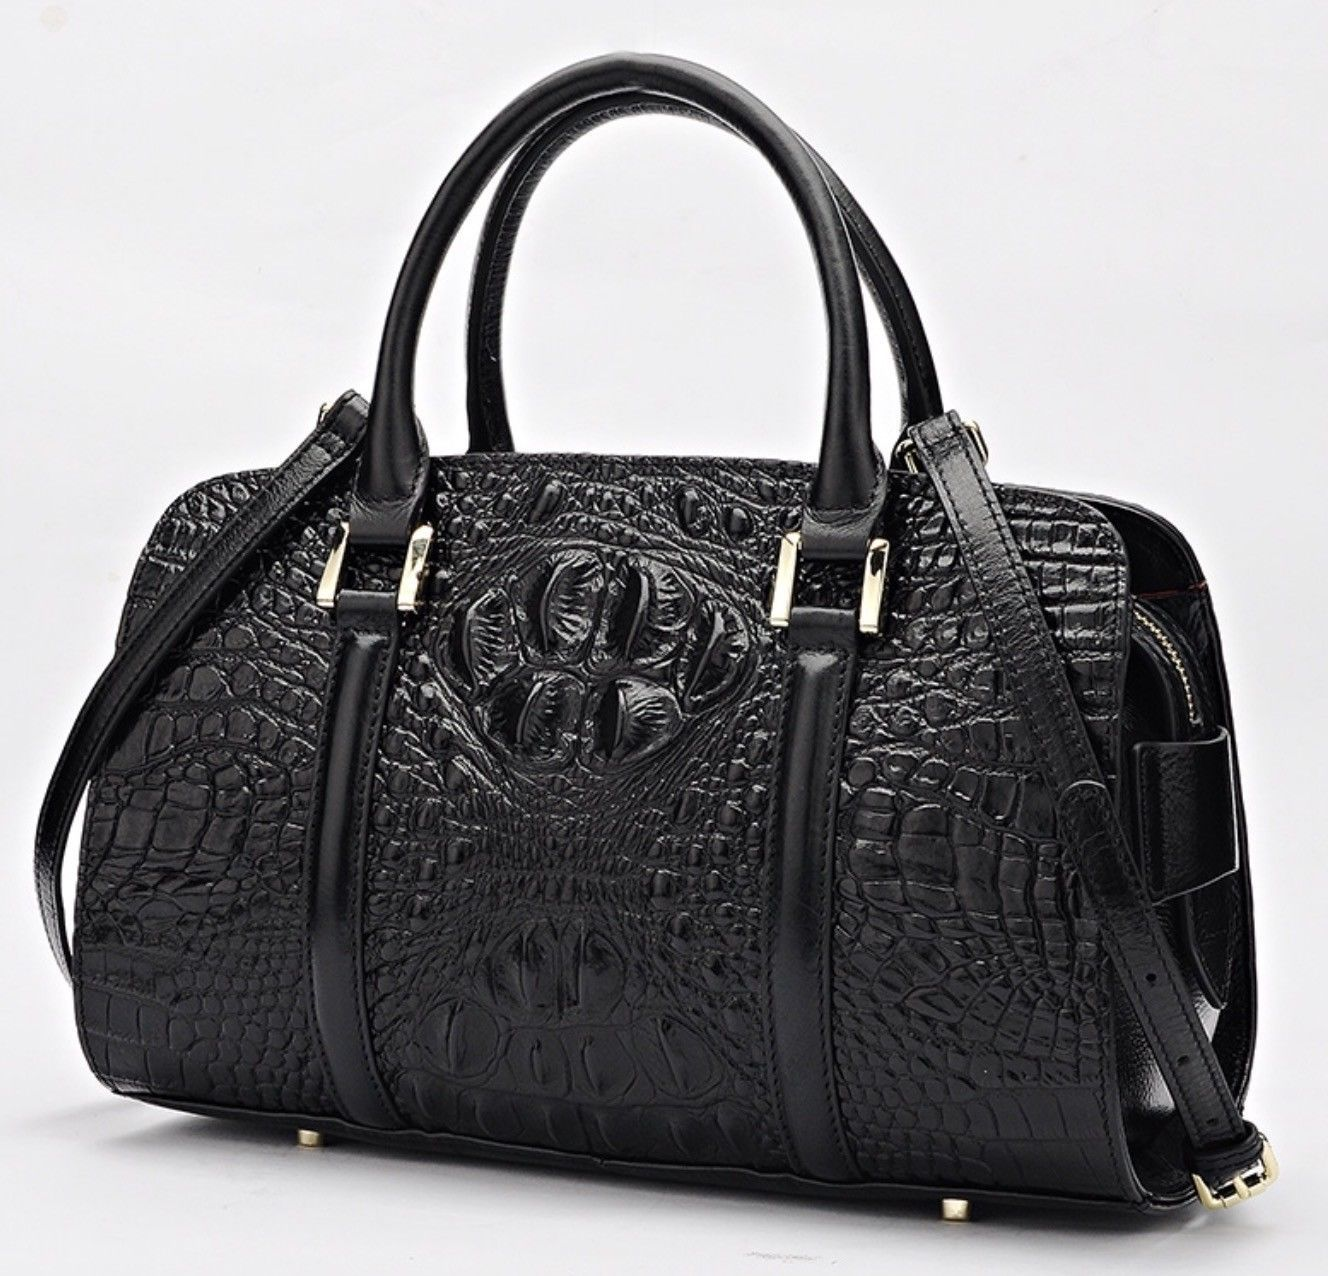 Crocodile Embossed Italian Leather Satchel Handbag Purse Croc Bag Shoulder Bag